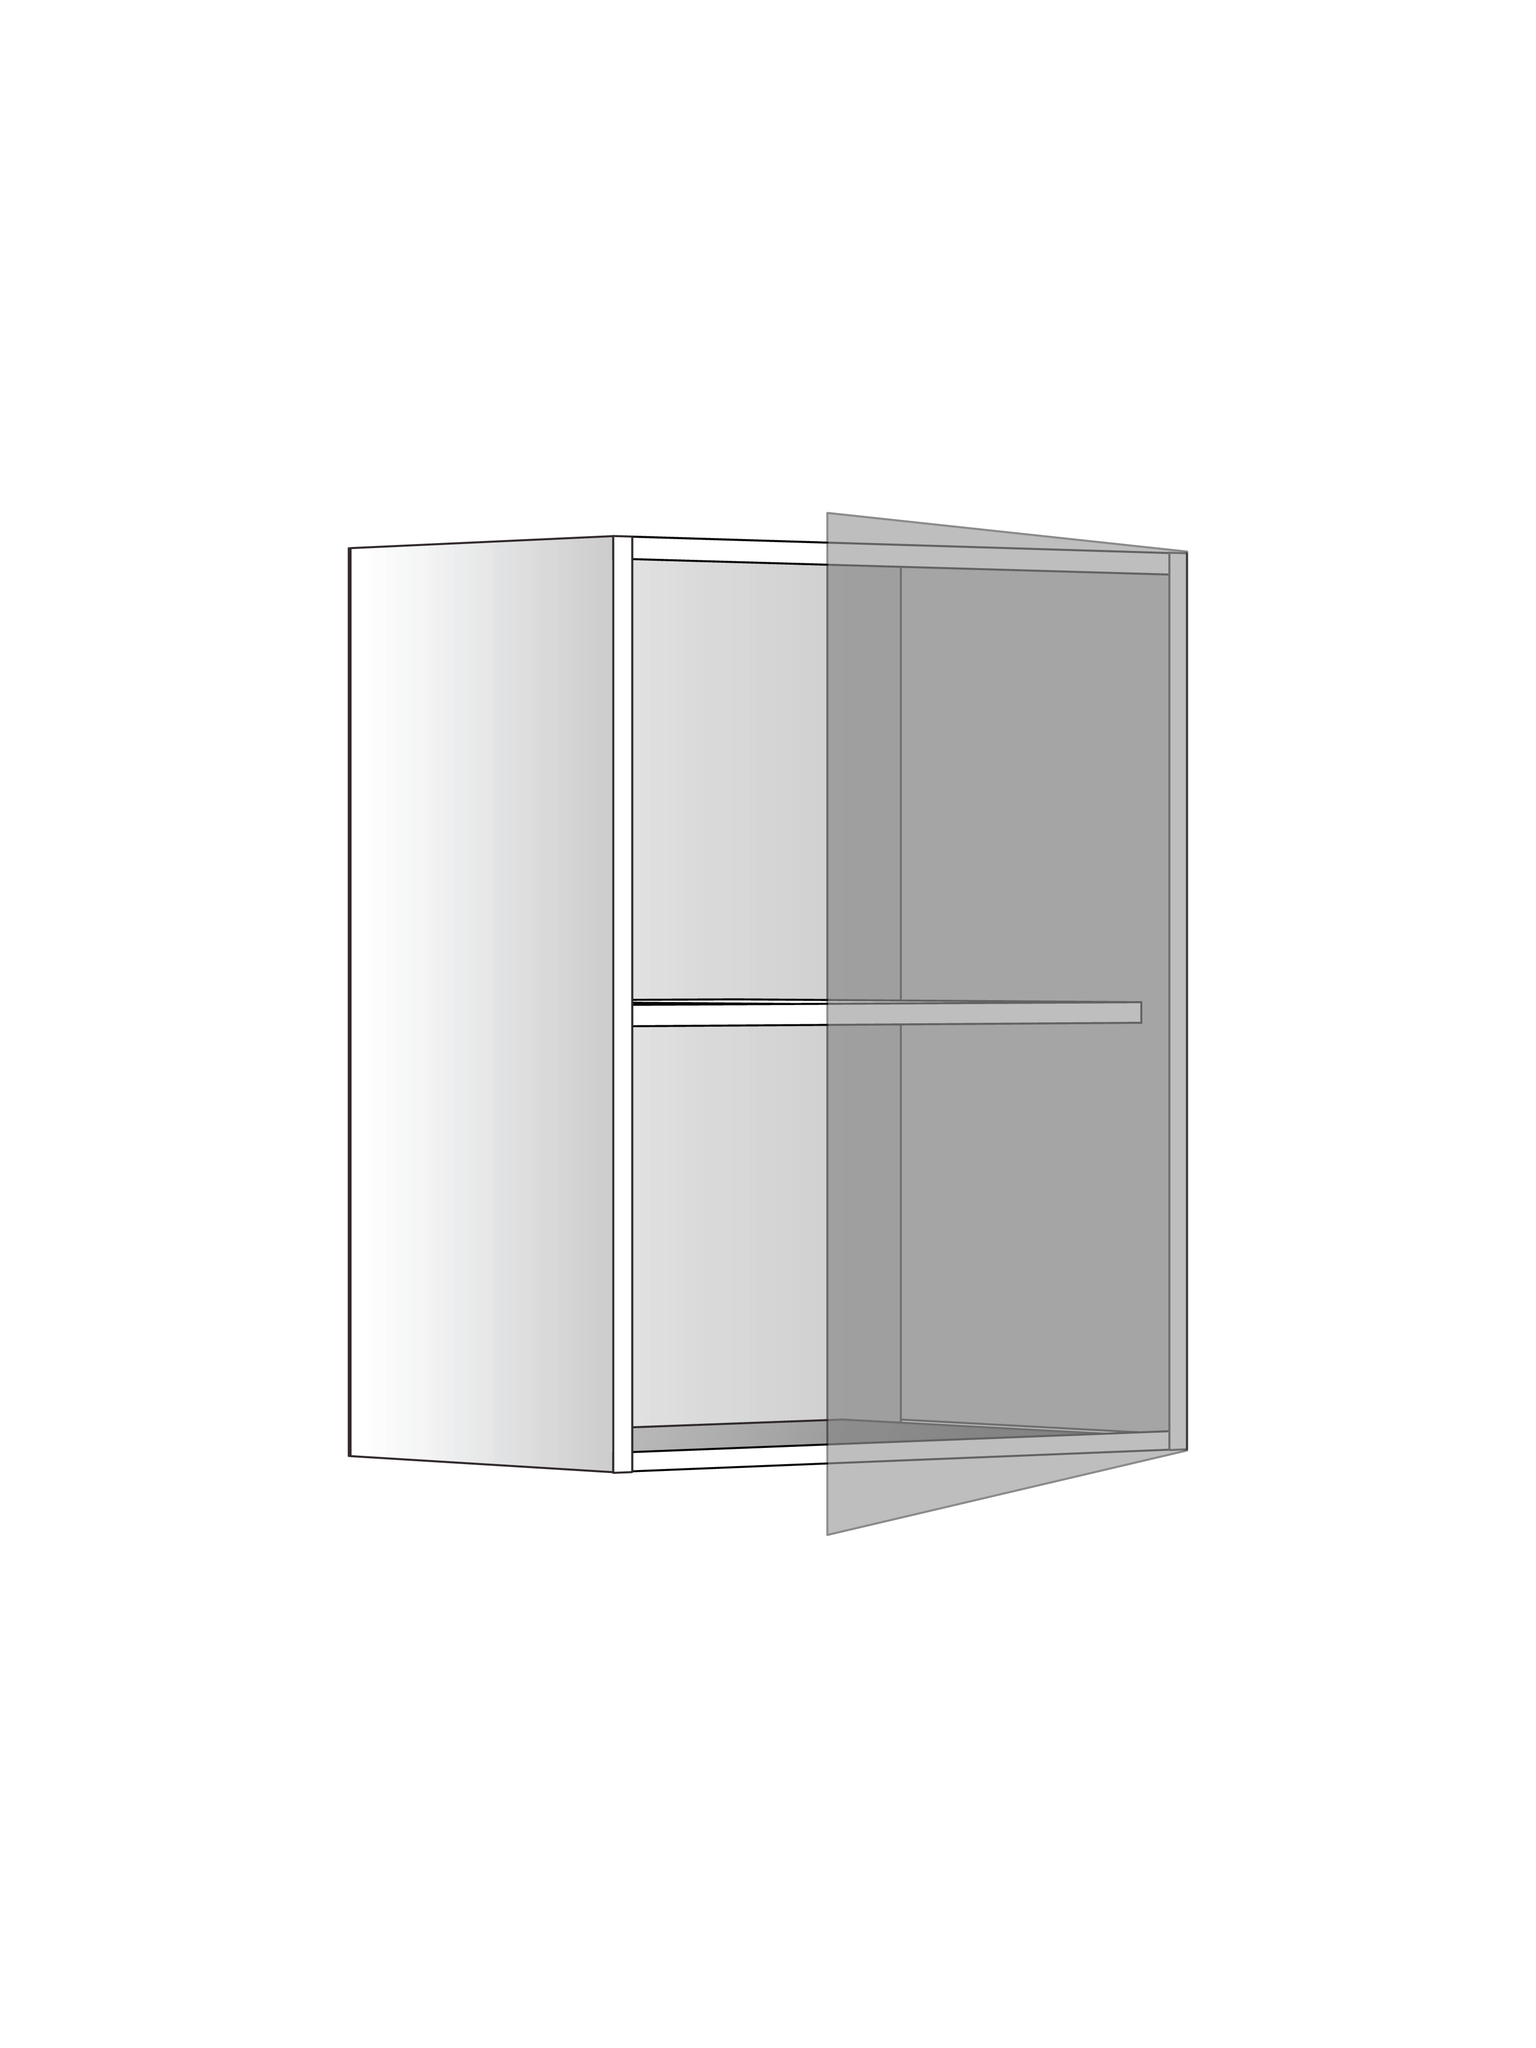 Верхний шкаф c одной полкой, 600х450 мм